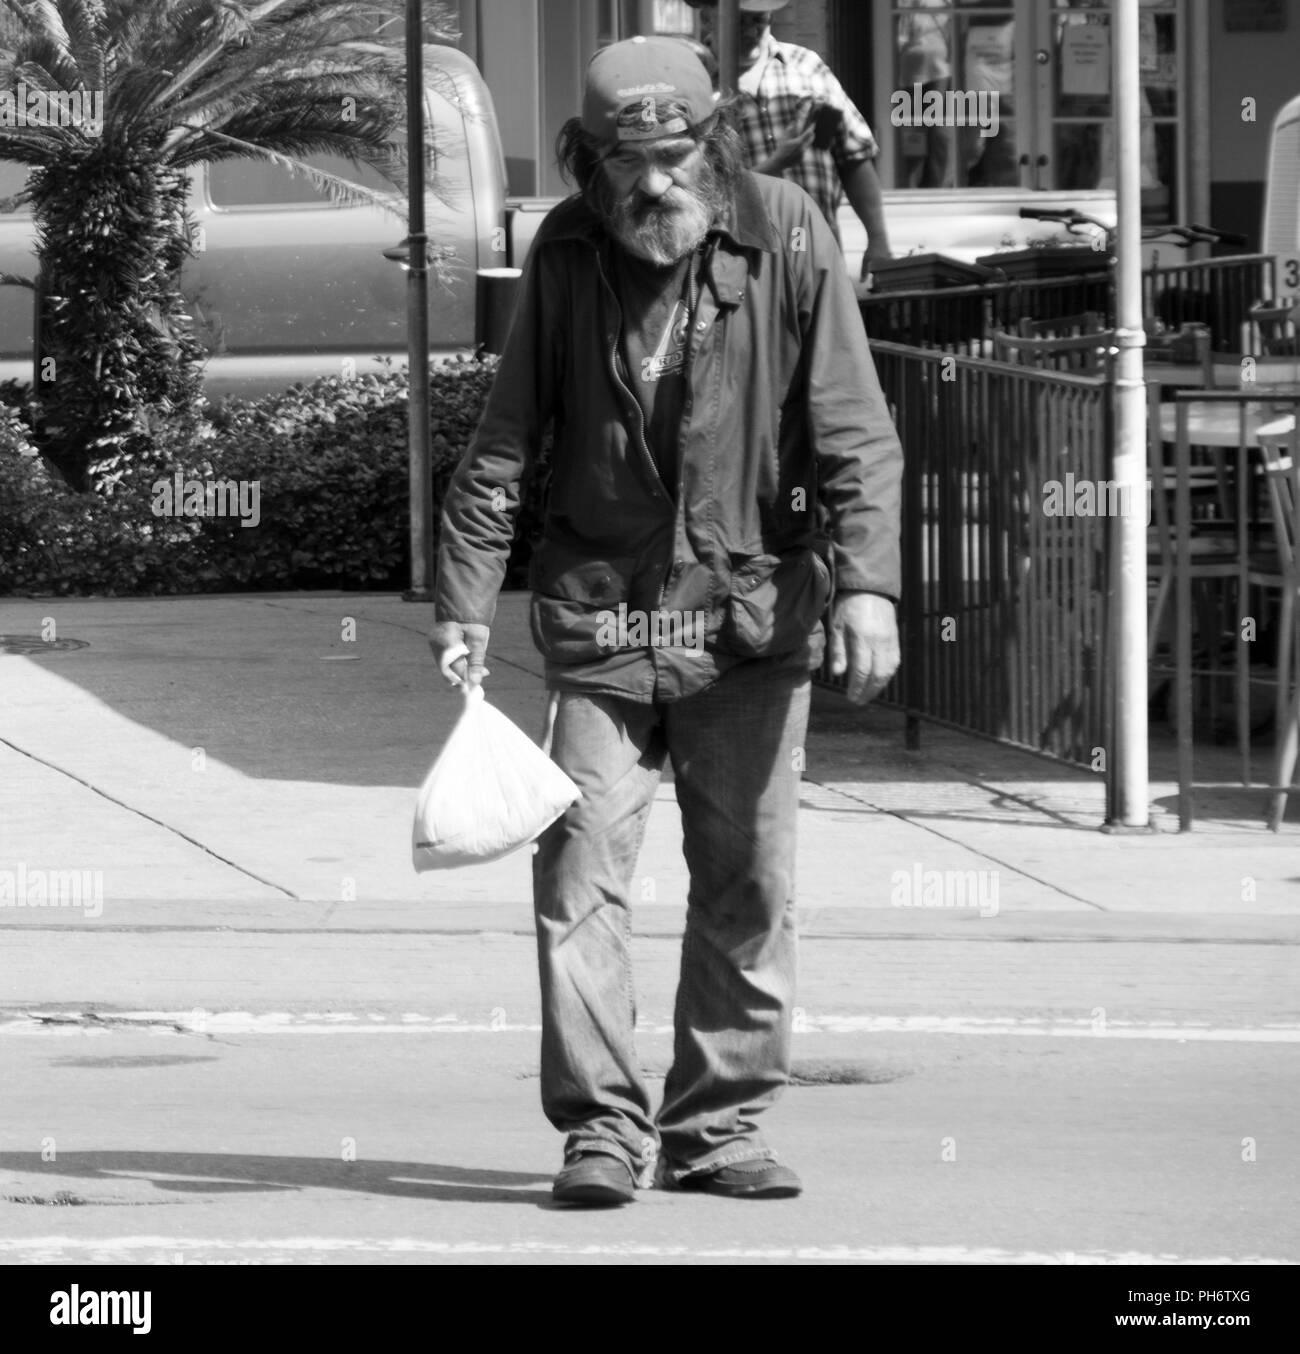 Homeless Man - Stock Image